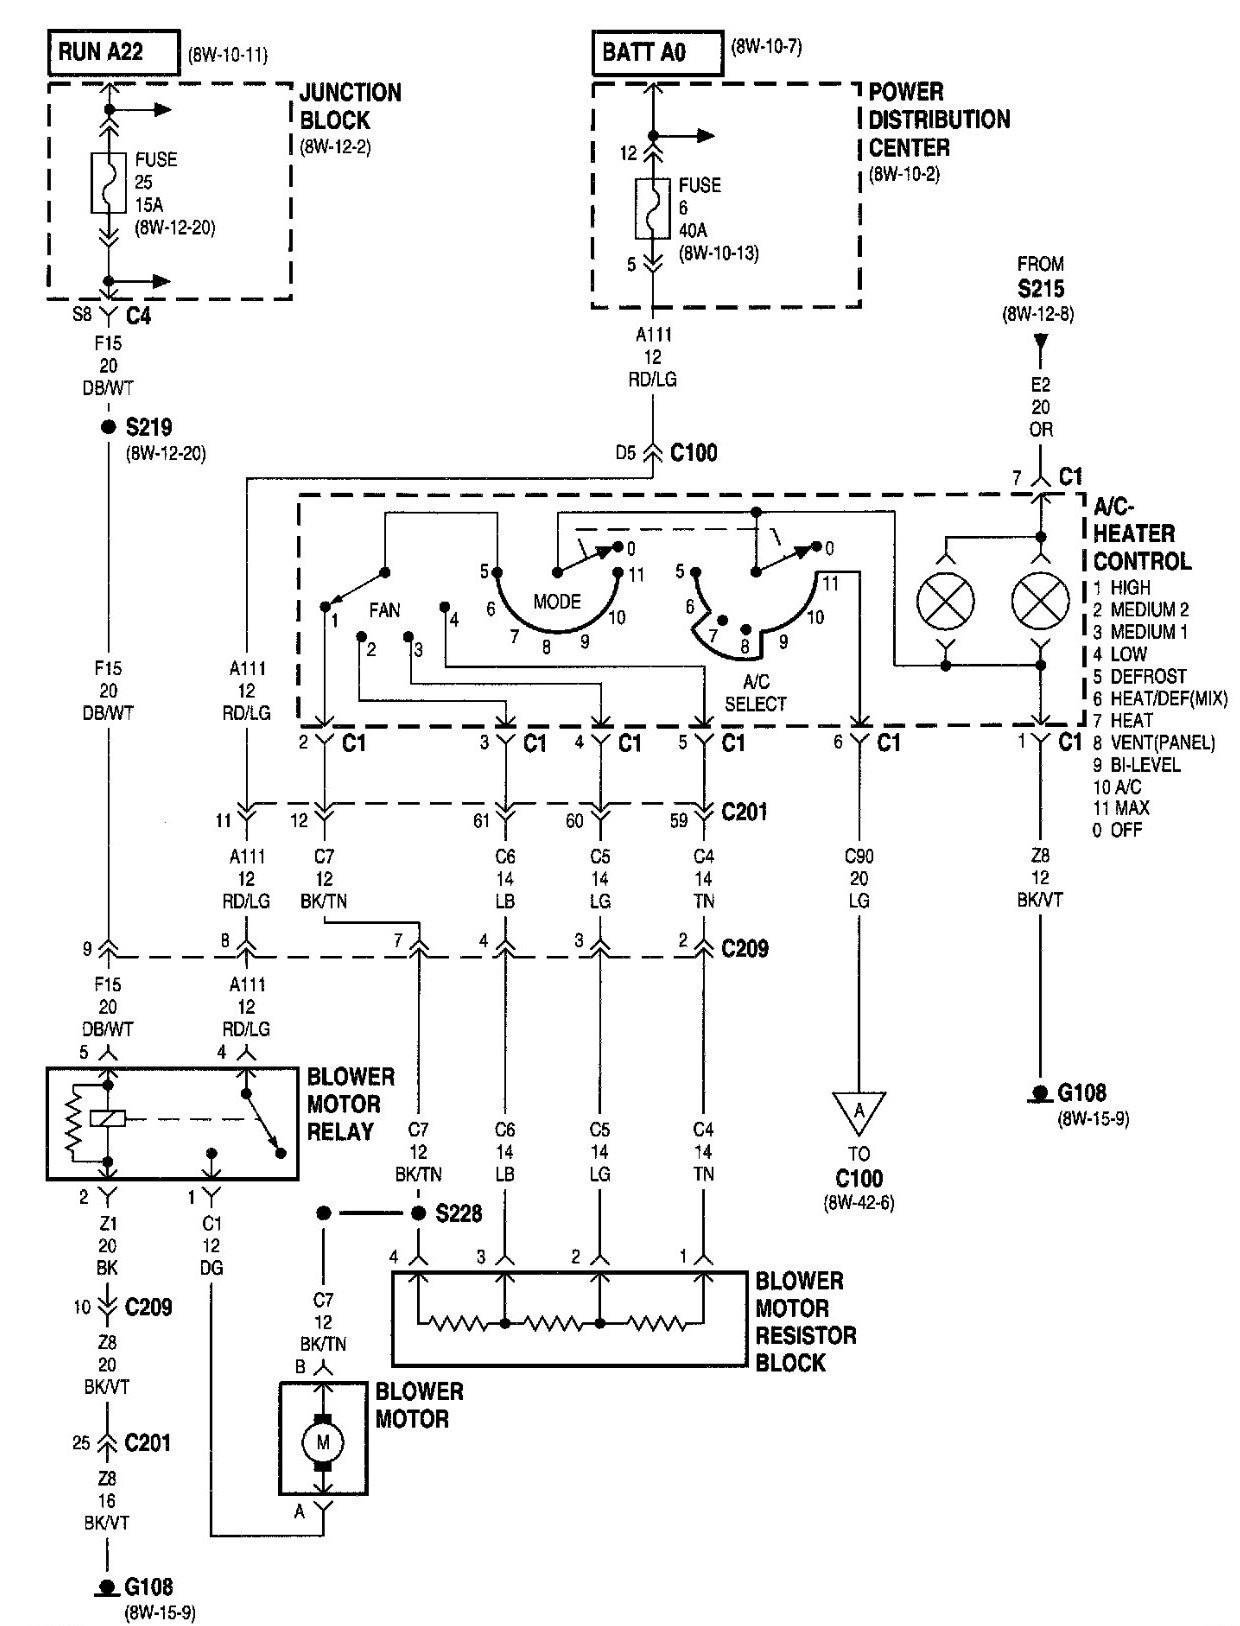 Honda Del sol Engine Diagram Honda B18 Engine Diagram Honda Wiring Diagrams Instructions Of Honda Del sol Engine Diagram